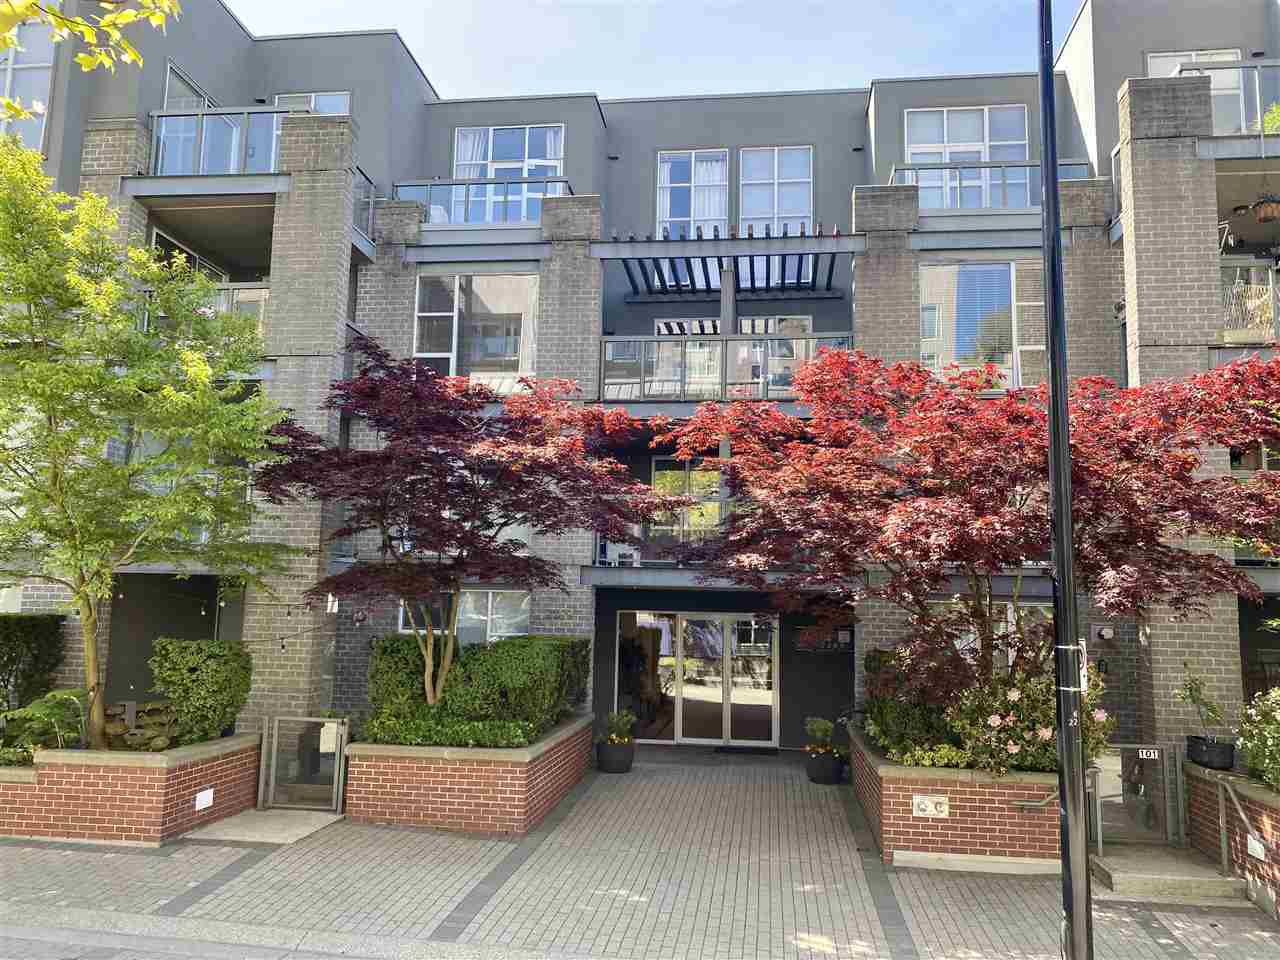 Main Photo: 313 2288 MARSTRAND AVENUE in Vancouver: Kitsilano Condo for sale (Vancouver West)  : MLS®# R2454175